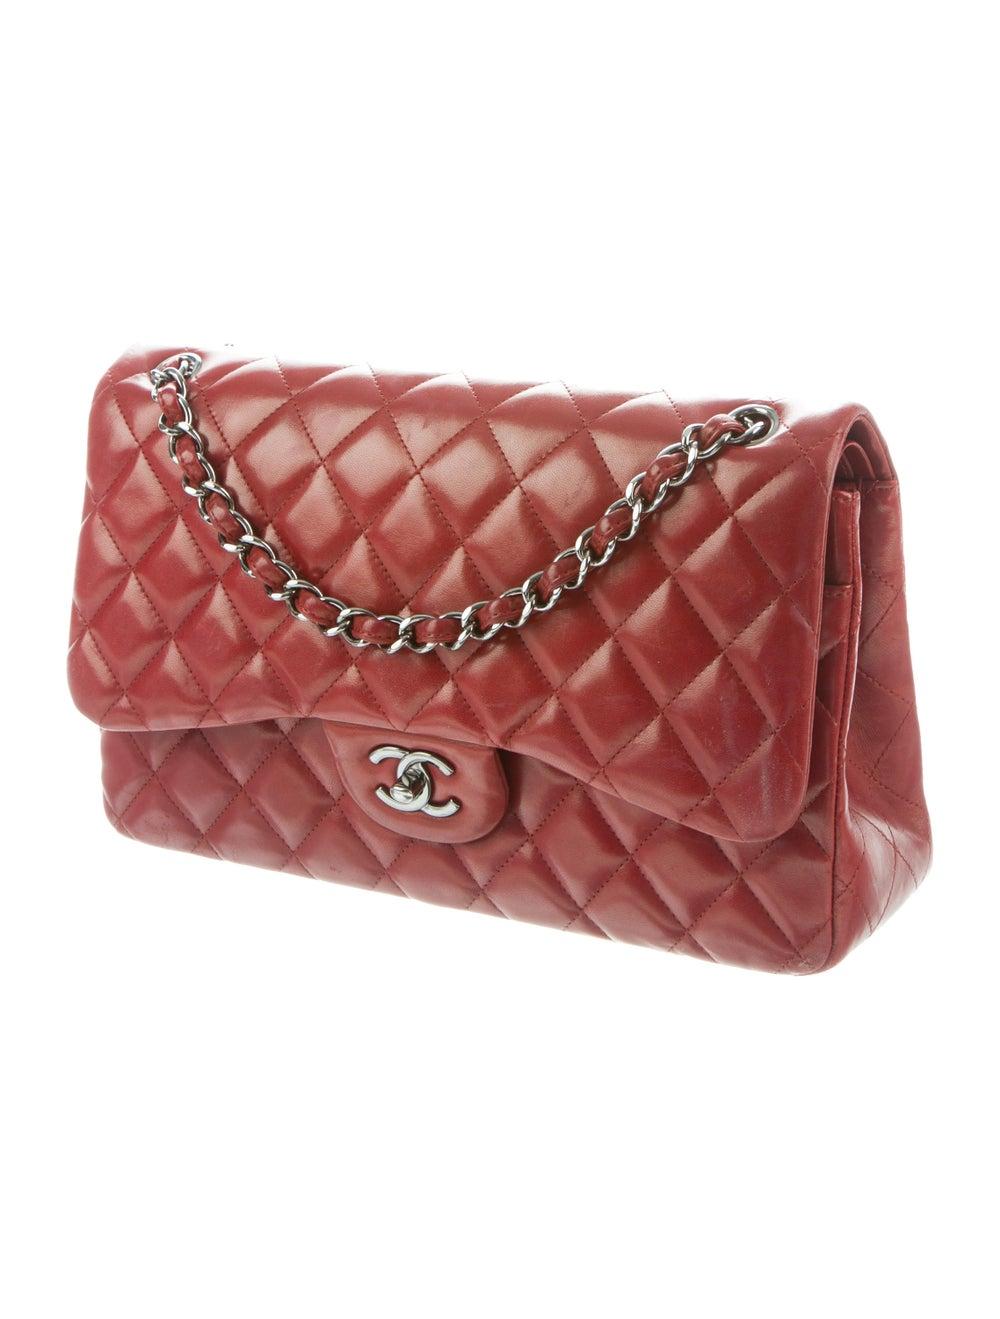 Chanel Jumbo Classic Double Flap Bag silver - image 3